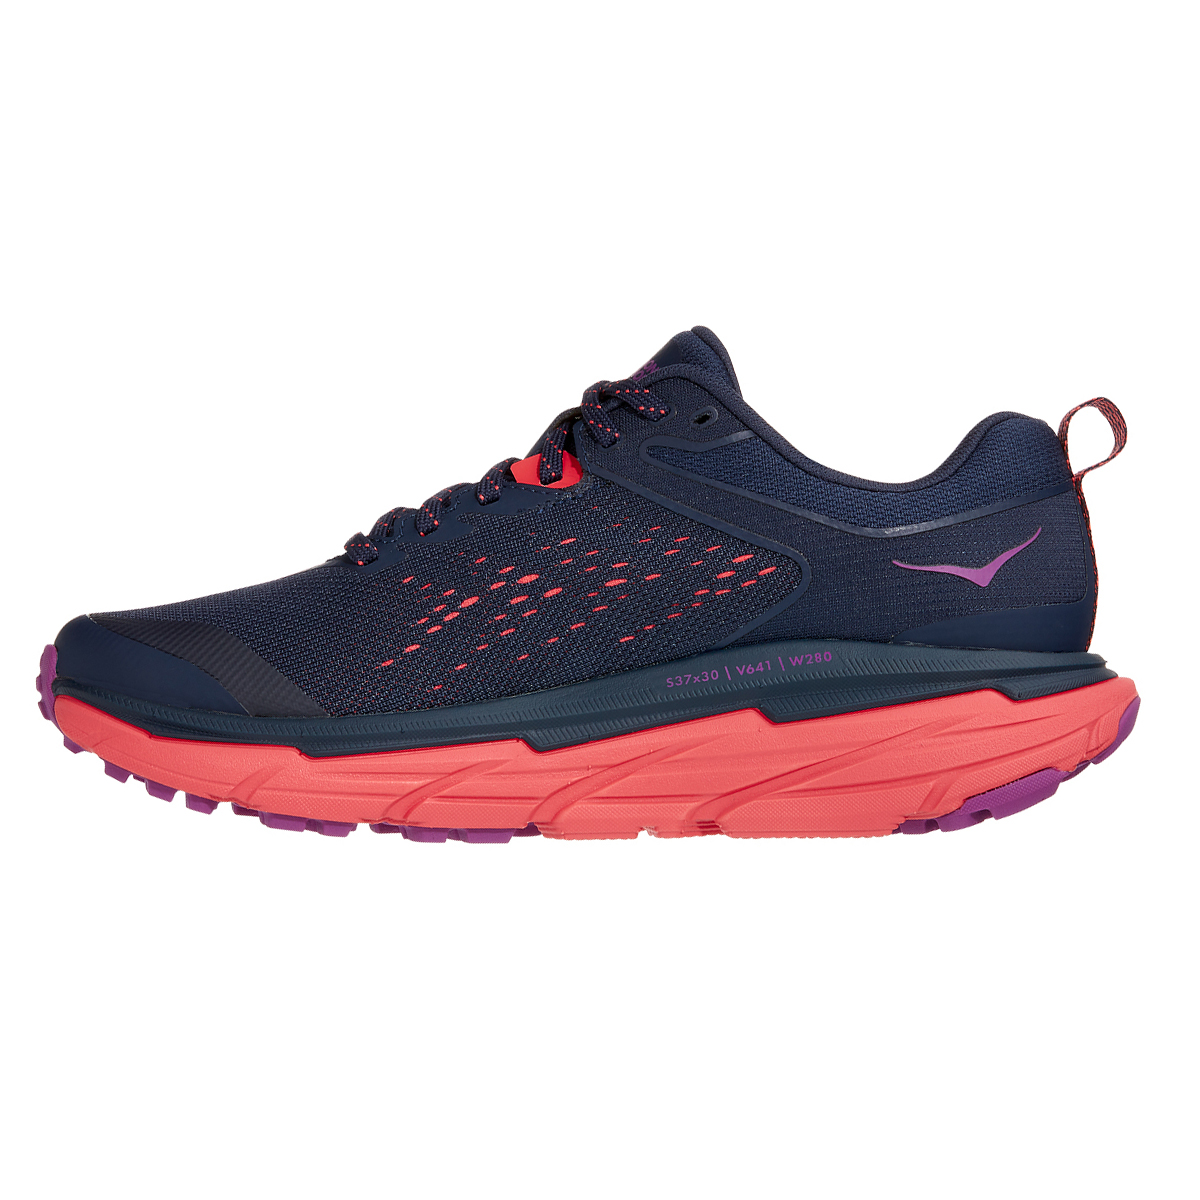 Women's Hoka One One Challenger ATR 6 Running Shoe - Color: Black Iris/Hot Coral - Size: 5 - Width: Regular, Black Iris/Hot Coral, large, image 2